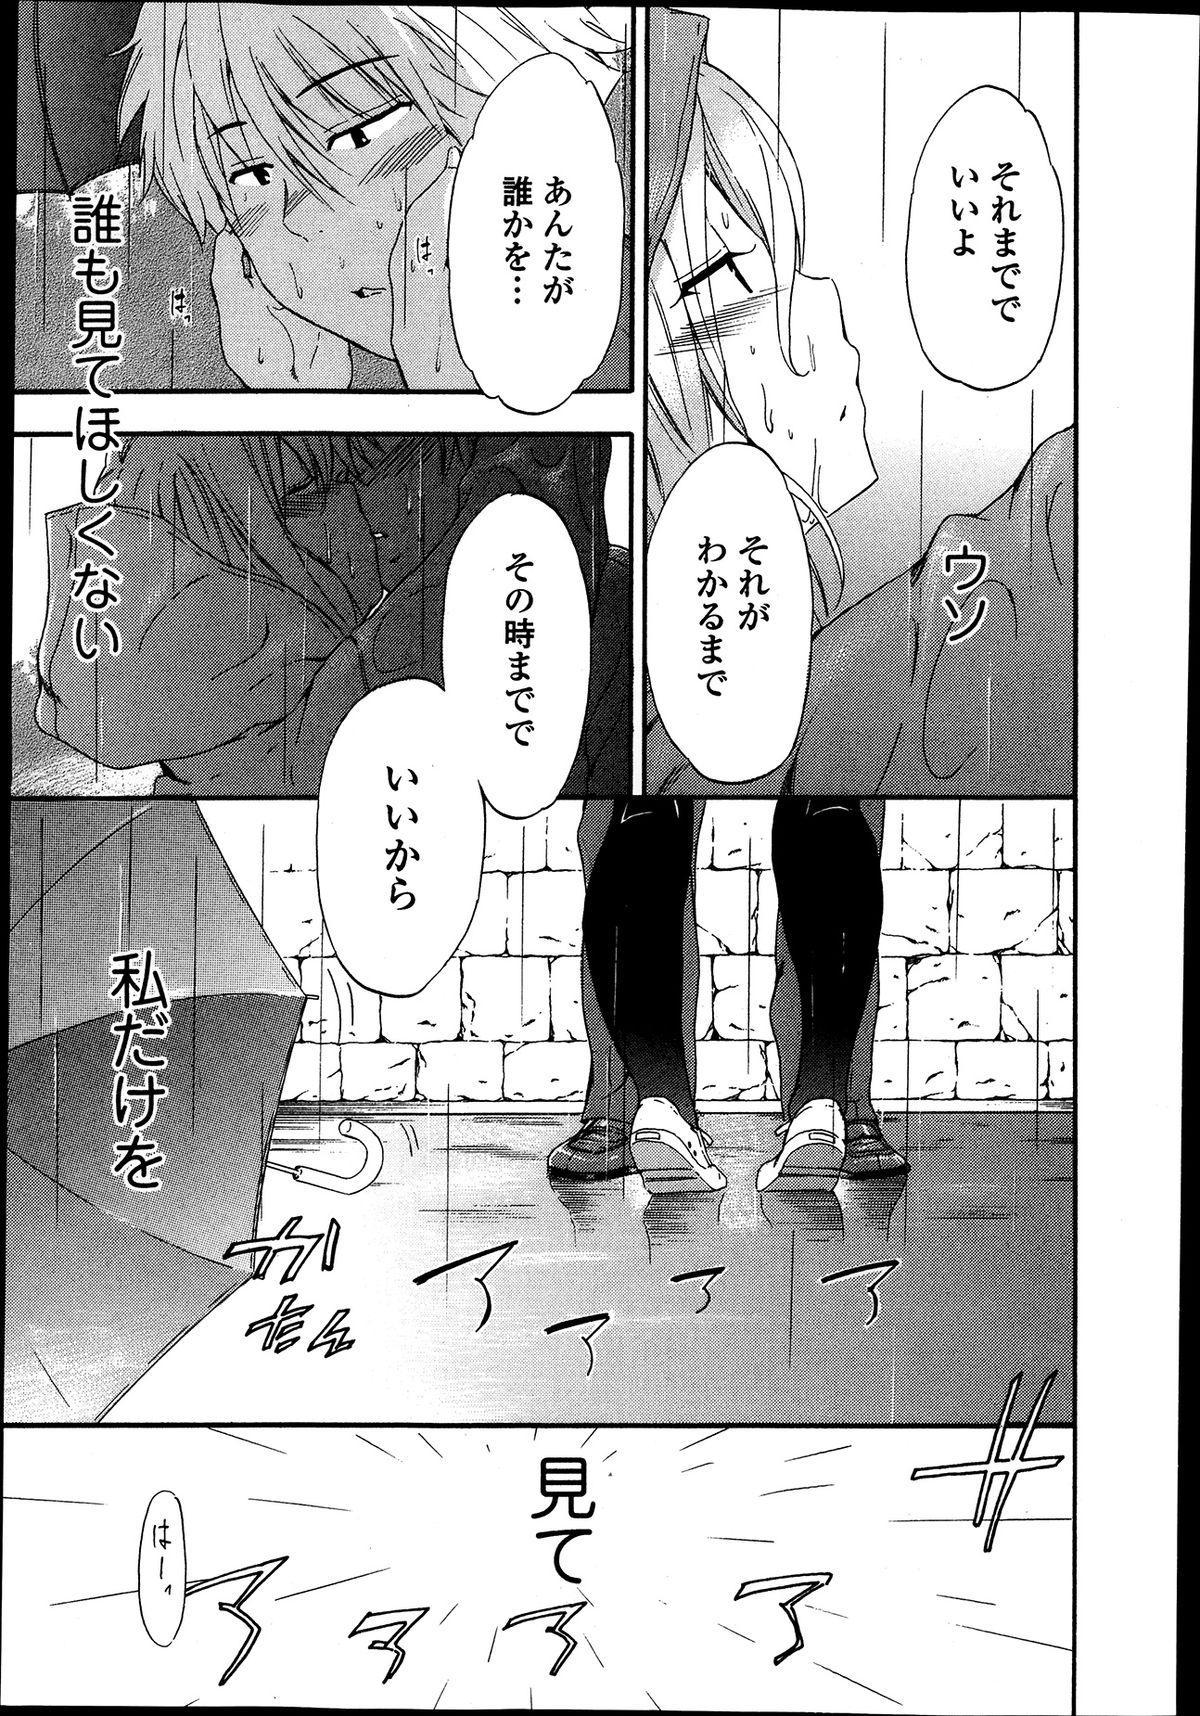 Bishoujo Kakumei KIWAME Road Vol.9 80